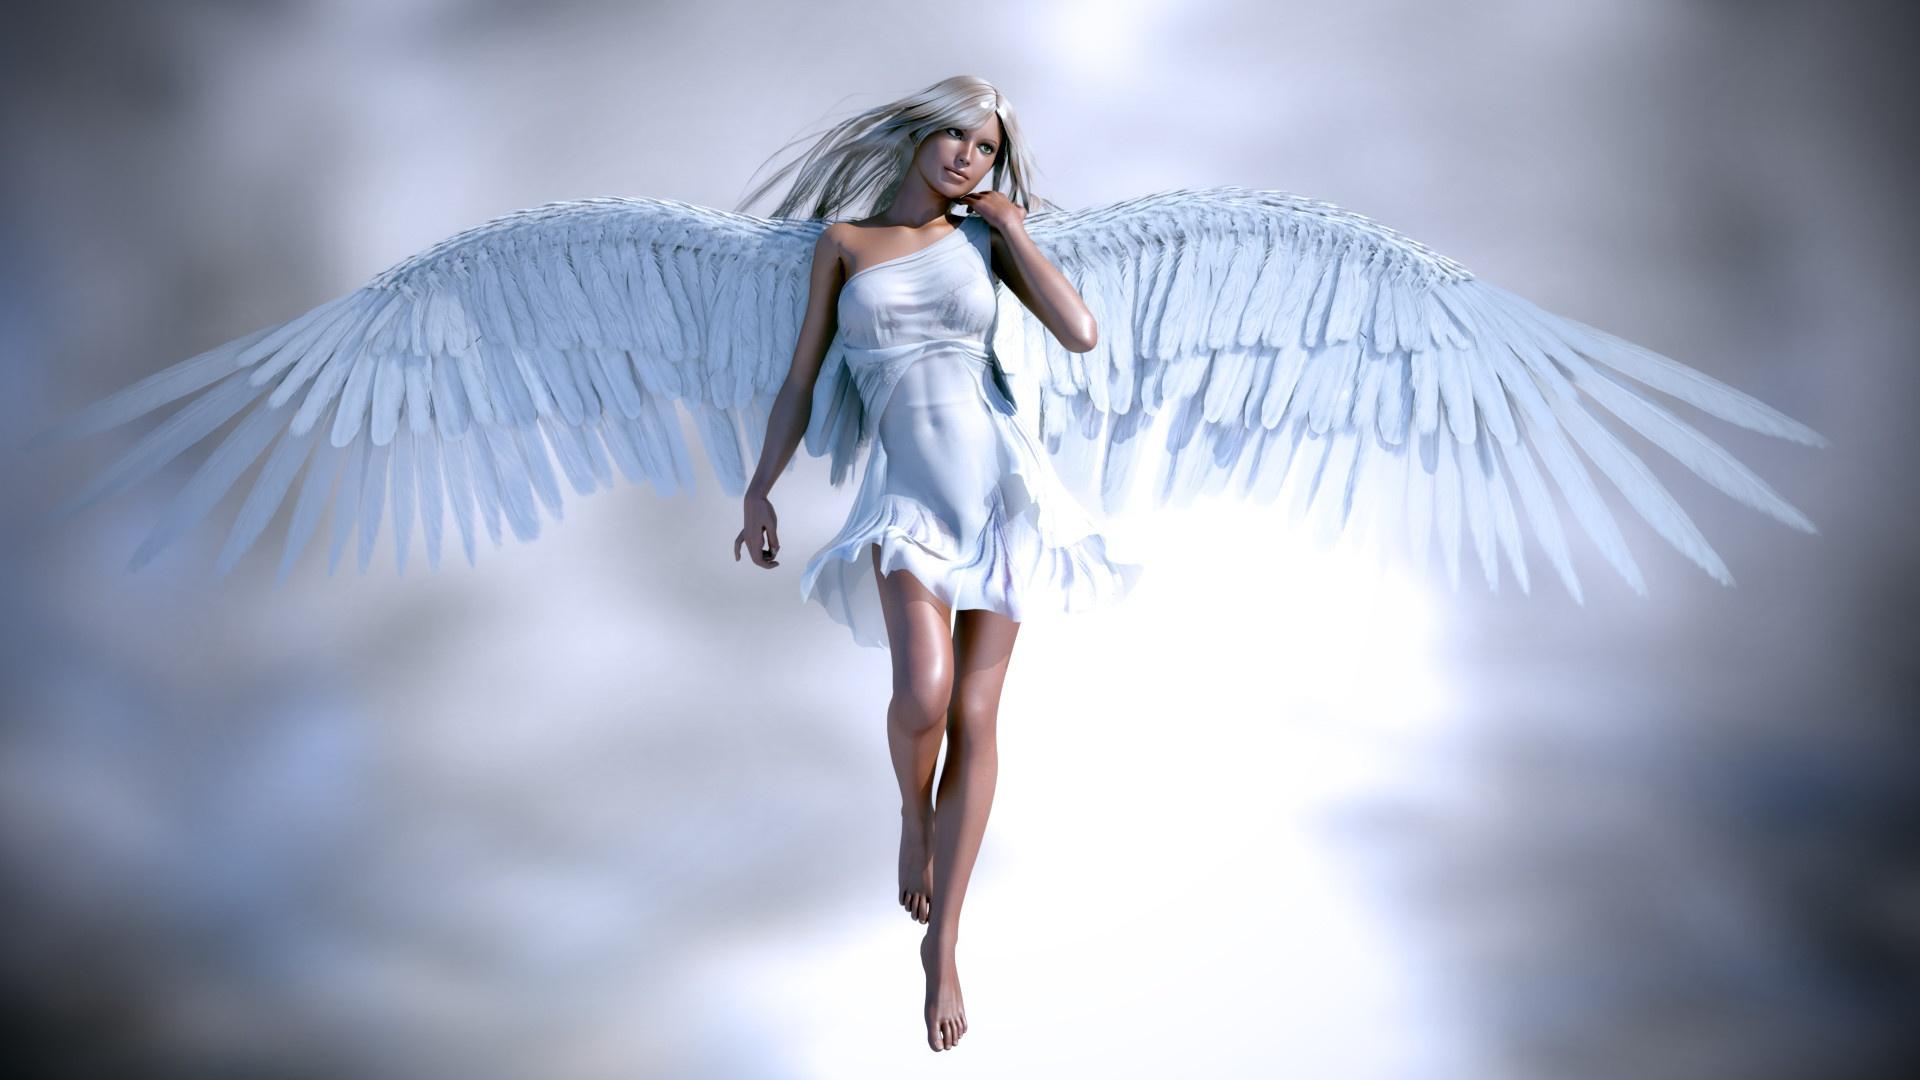 Ангел крылья картинки красивые